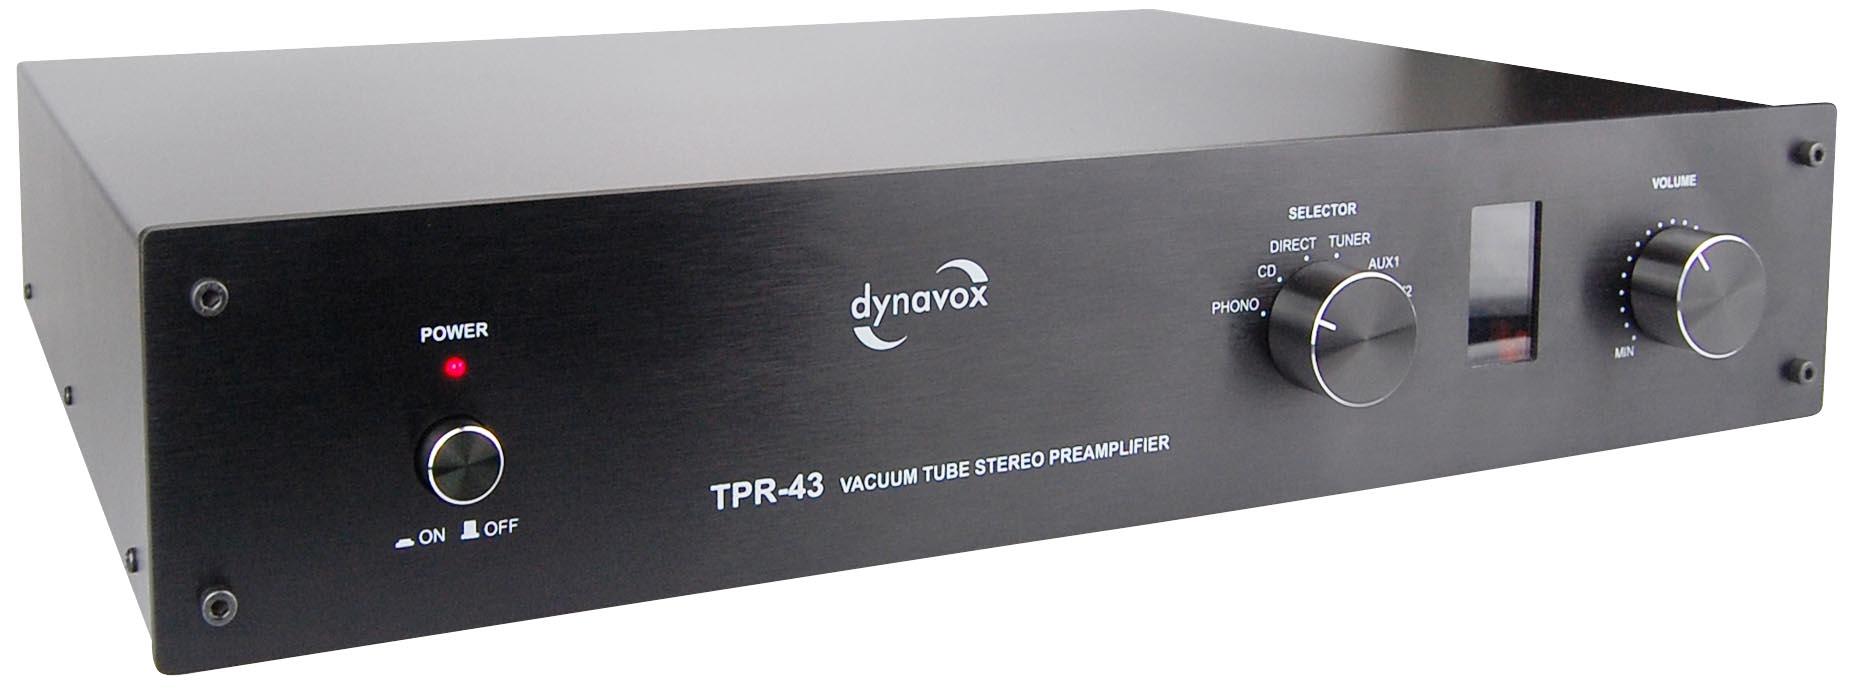 Dynavox TPR-43